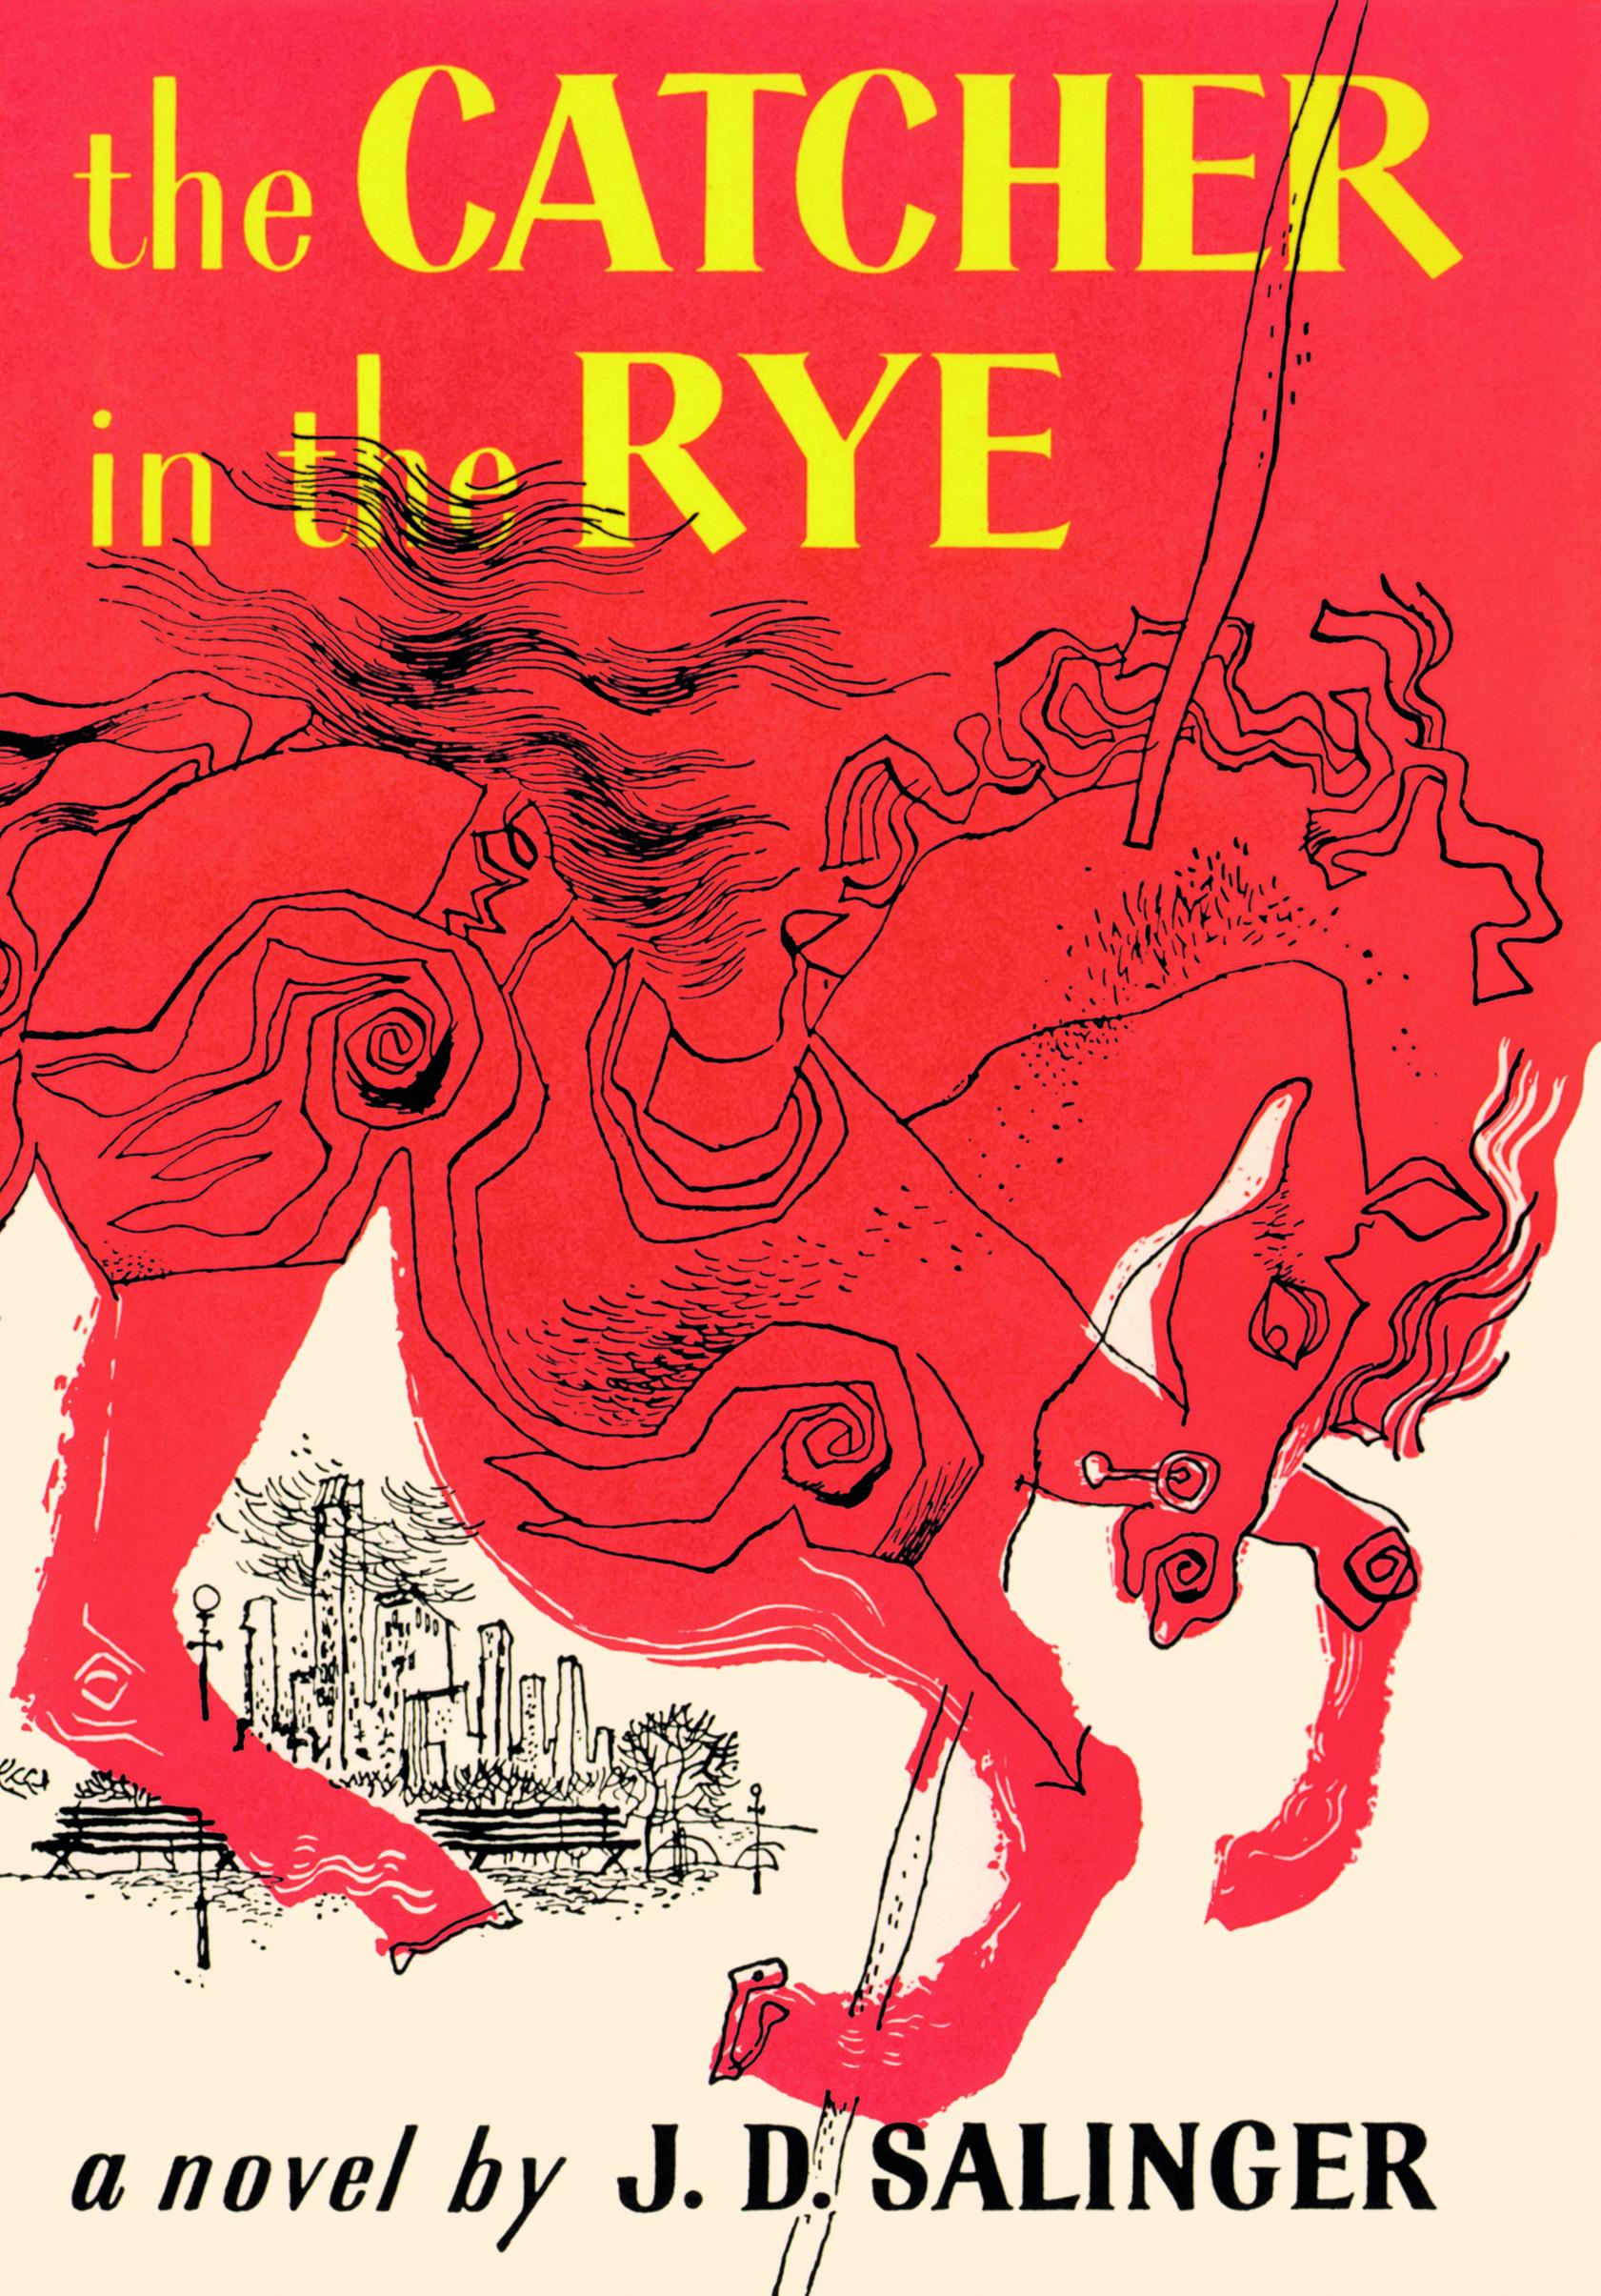 catcher-in-the-rye-cover.jpg